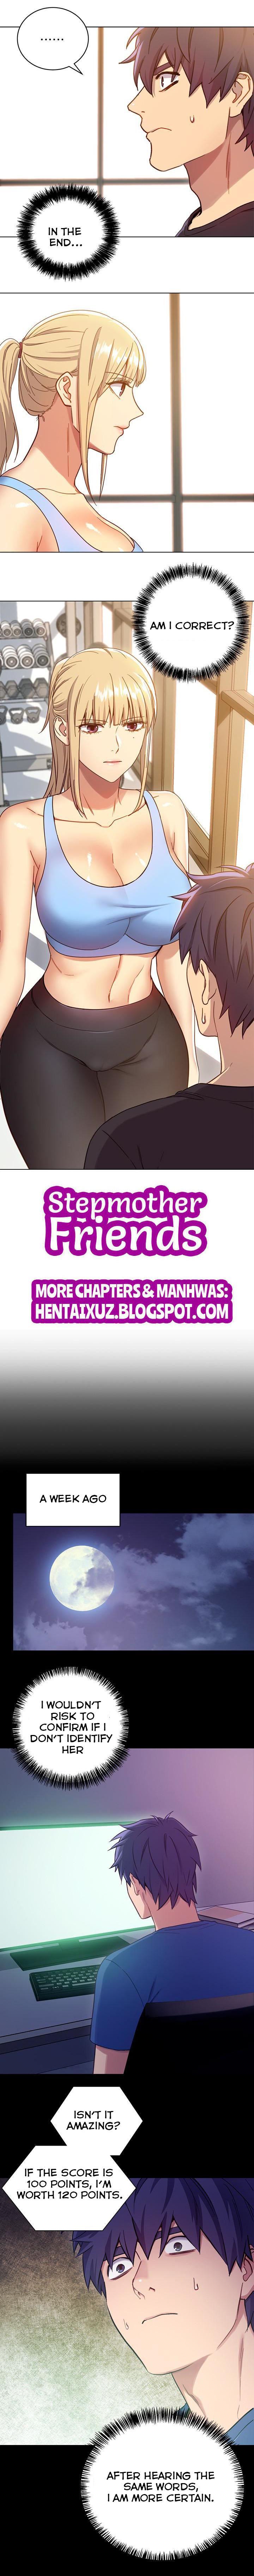 [Neck Pilllow] Stepmother Friends Ch.39/? [English] [Hentai Universe] NEW! 13/10/2020 78